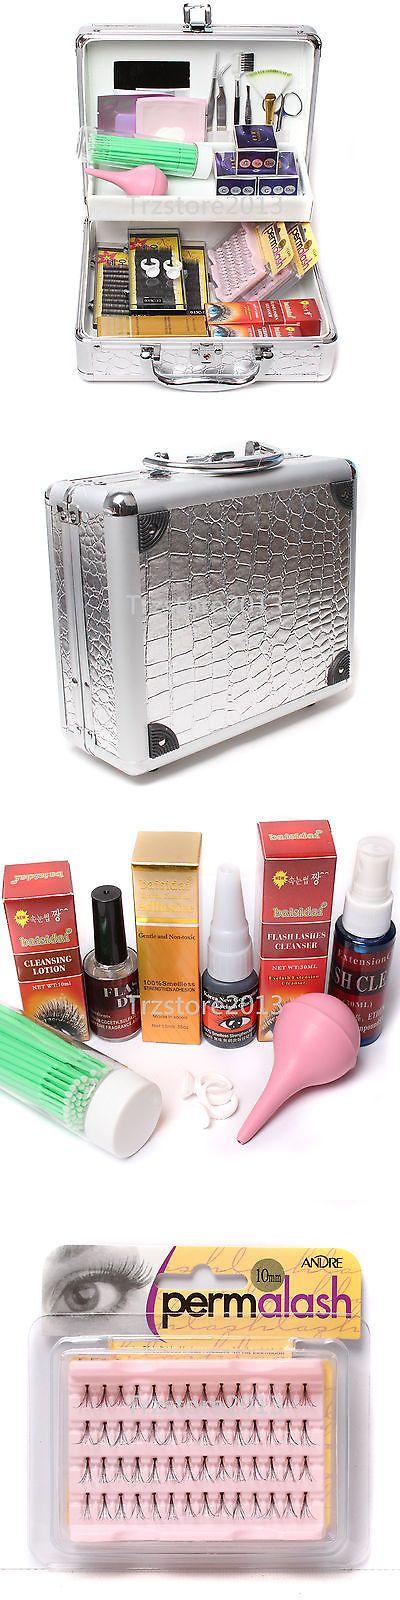 Makeup Sets and Kits: False Lashes Individual Extension Eyelash Micro Brushes Glue Tools Kits Case Set BUY IT NOW ONLY: $56.99